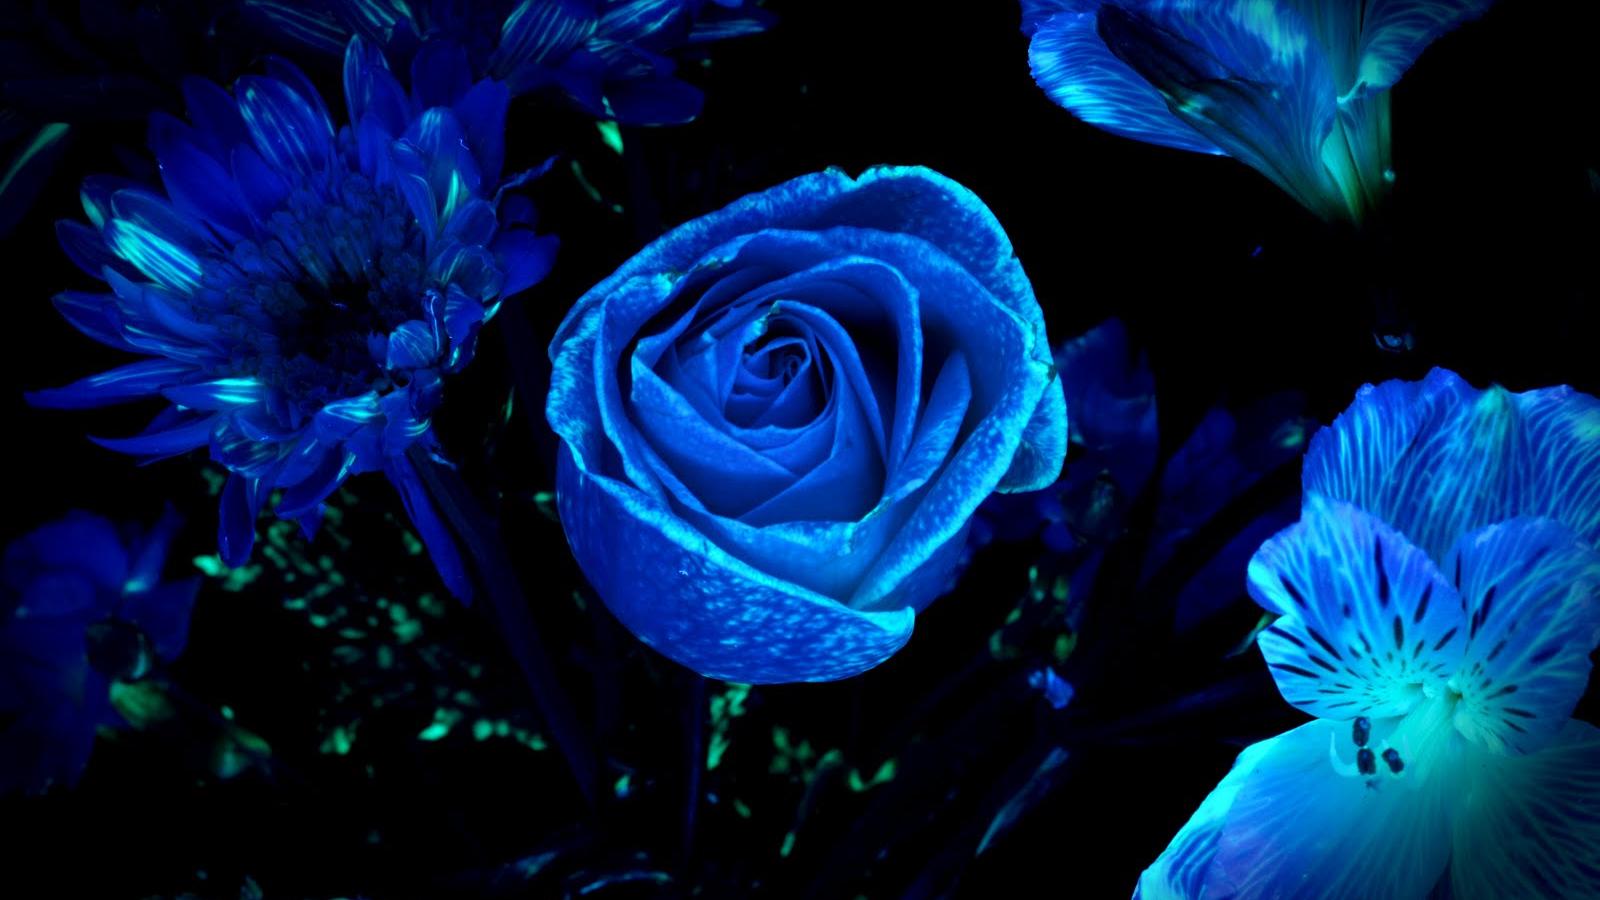 Dark Blue Floral Wallpaper Travis Draney Art And Stuff 1600x1071 Download Resolutions Desktop 1600x900